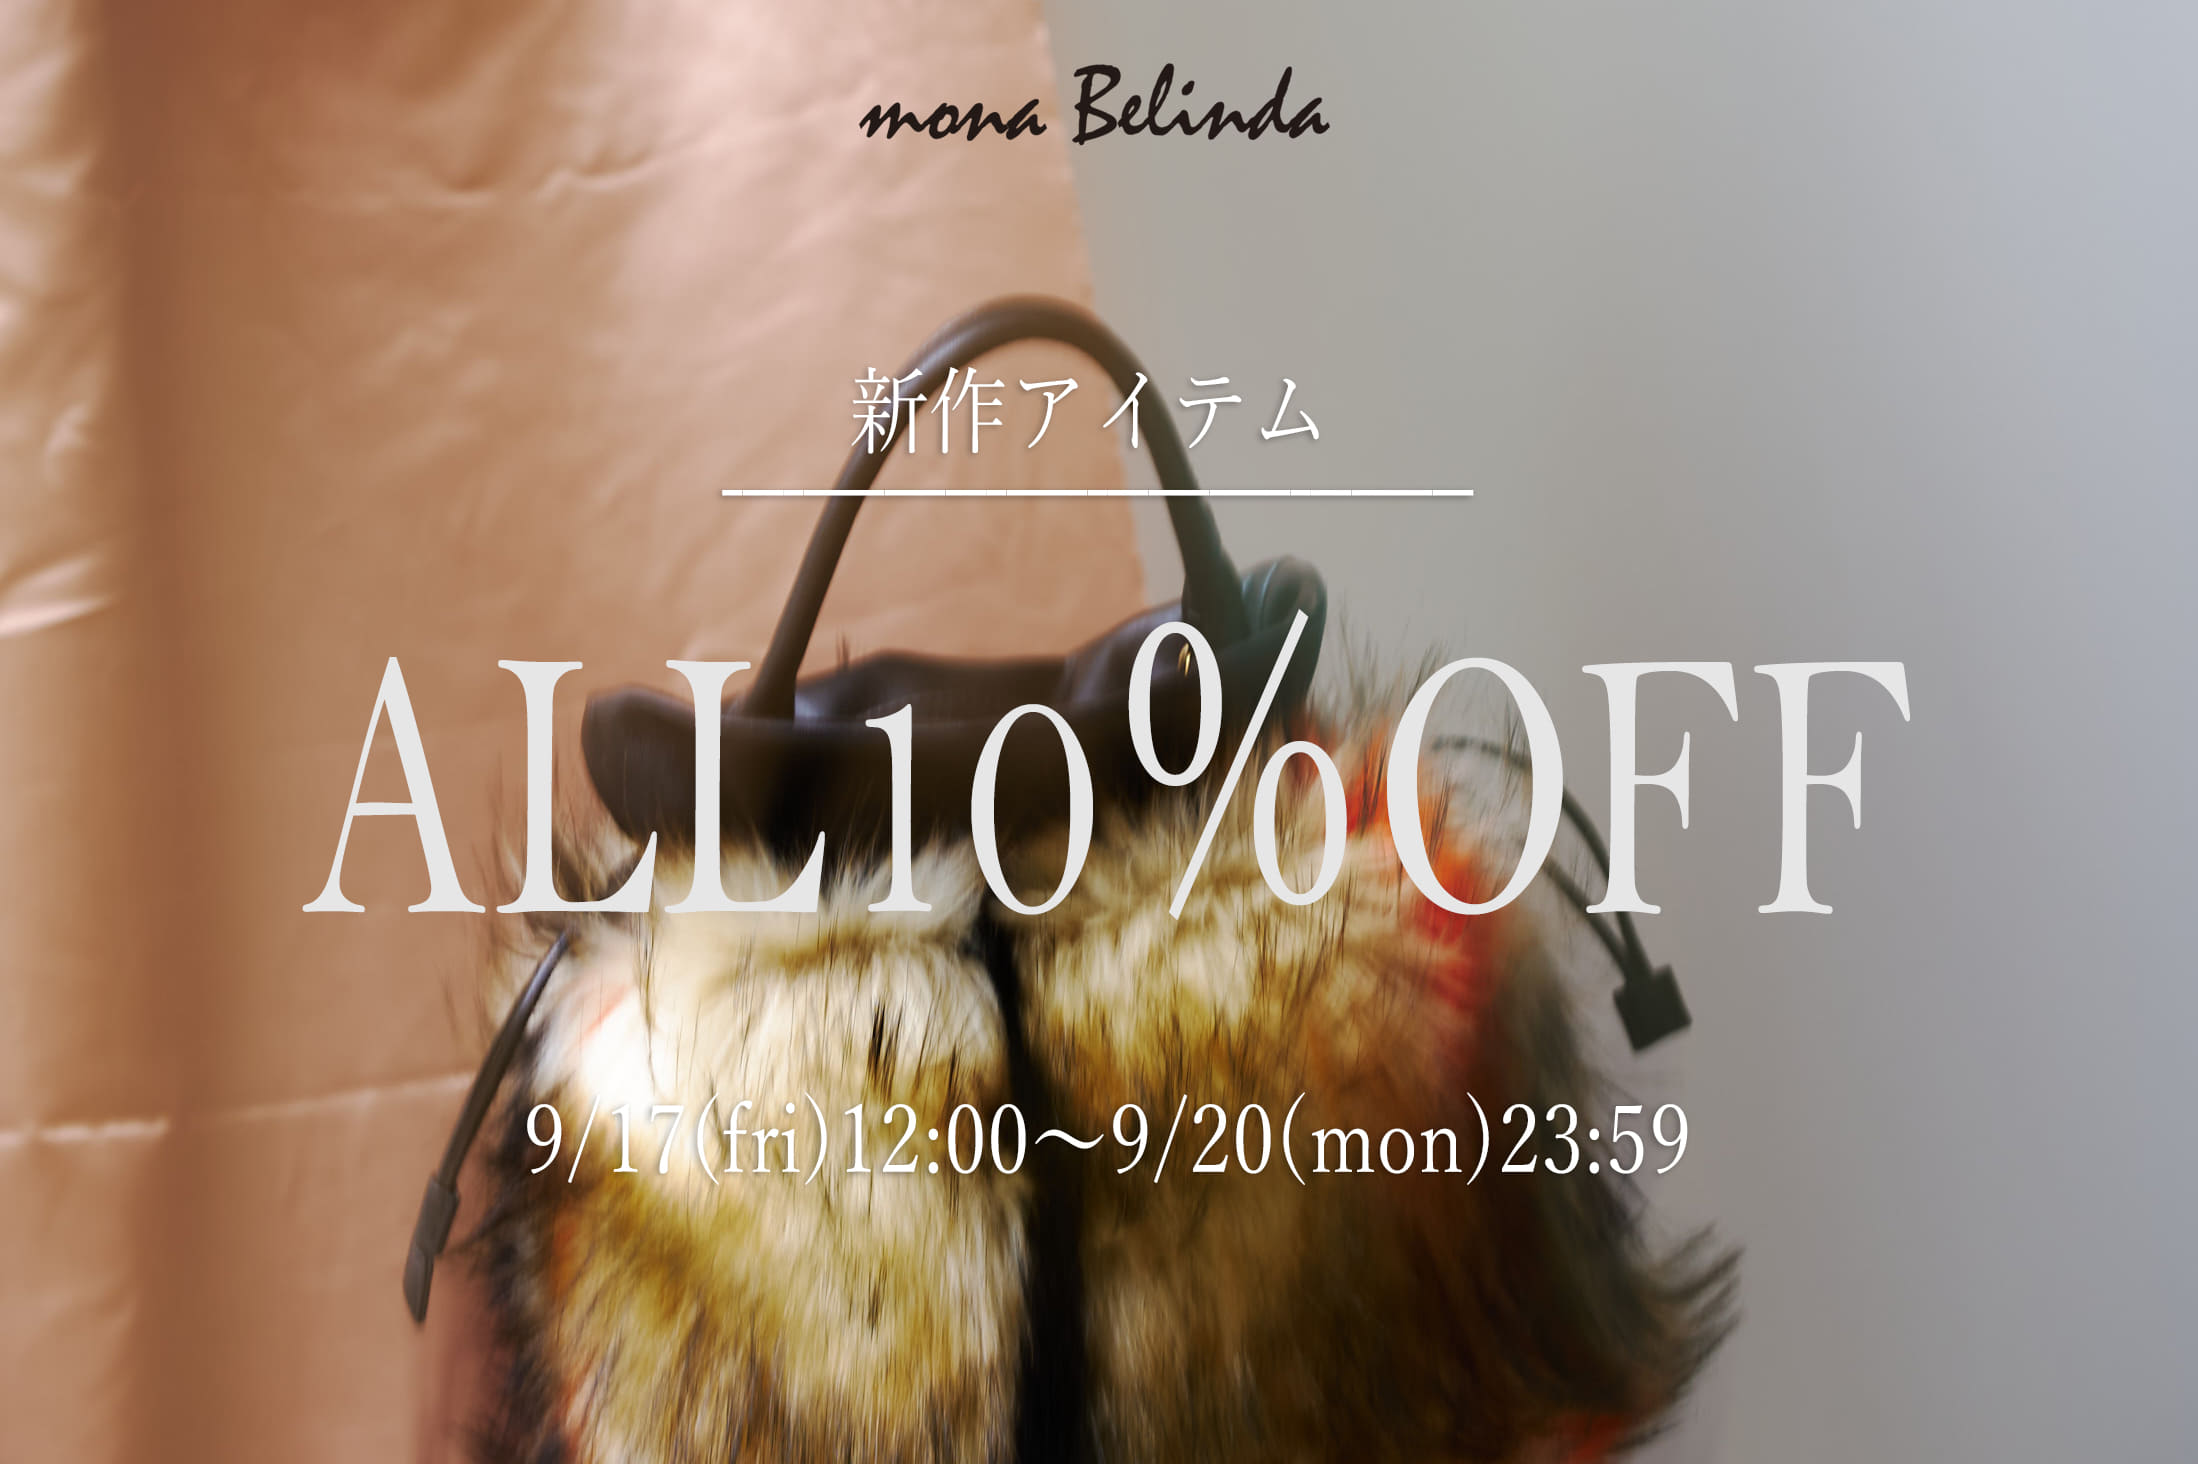 mona Belinda 【期間限定】予約商品含むプロパー全品10%OFF!